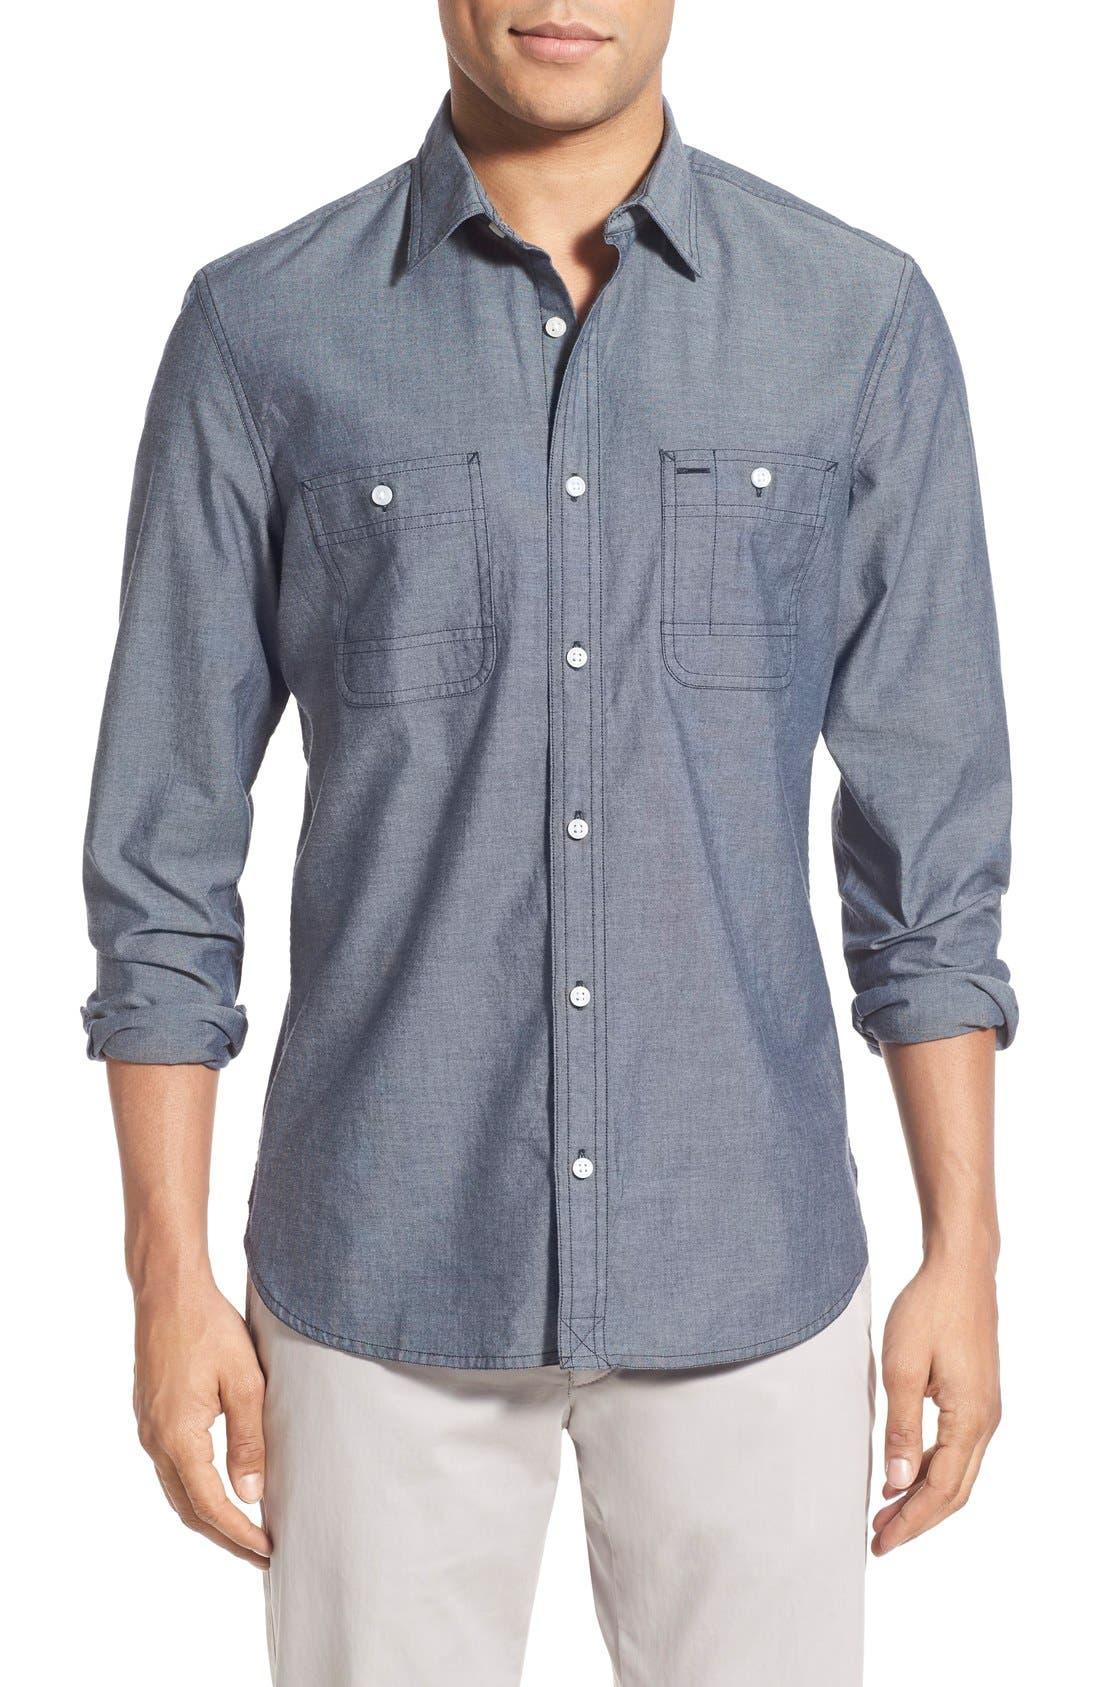 Main Image - Wallin & Bros. 'Workwear' Trim Fit Chambray Sport Shirt (Regular & Tall)